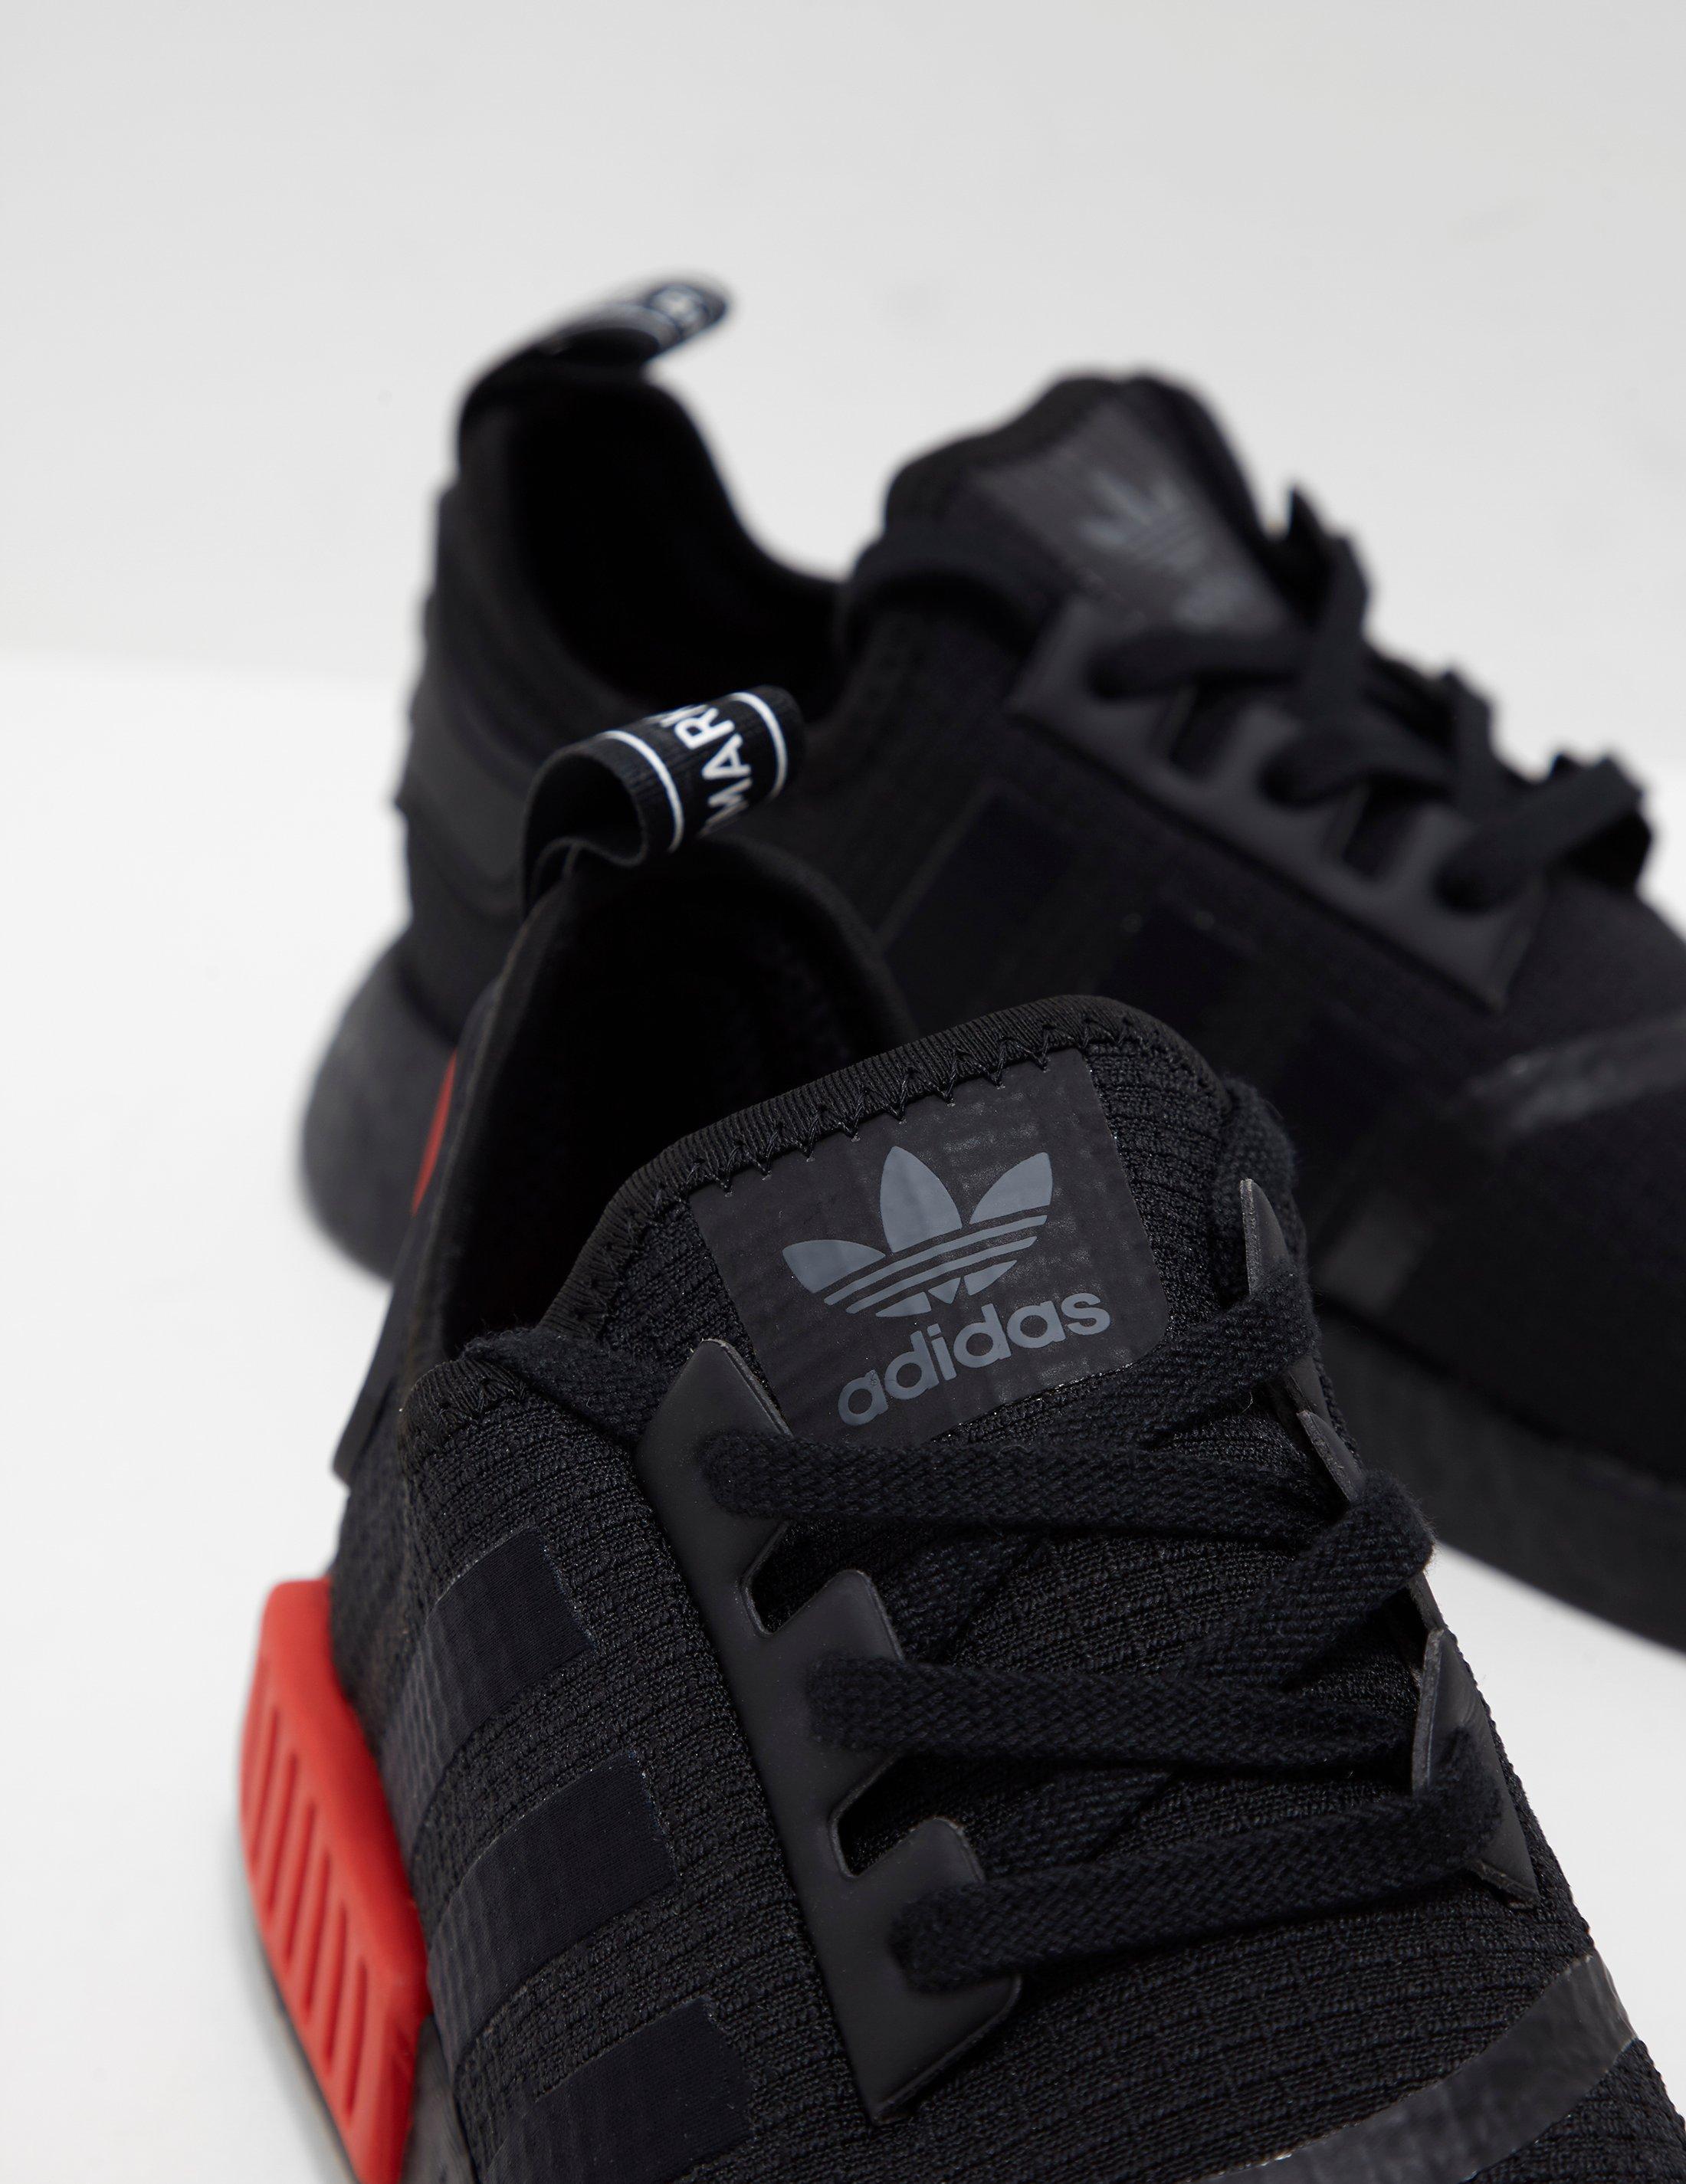 bd9b89b0e363c9 Adidas Originals Mens Nmd R1 Ripstop Black in Black for Men - Lyst